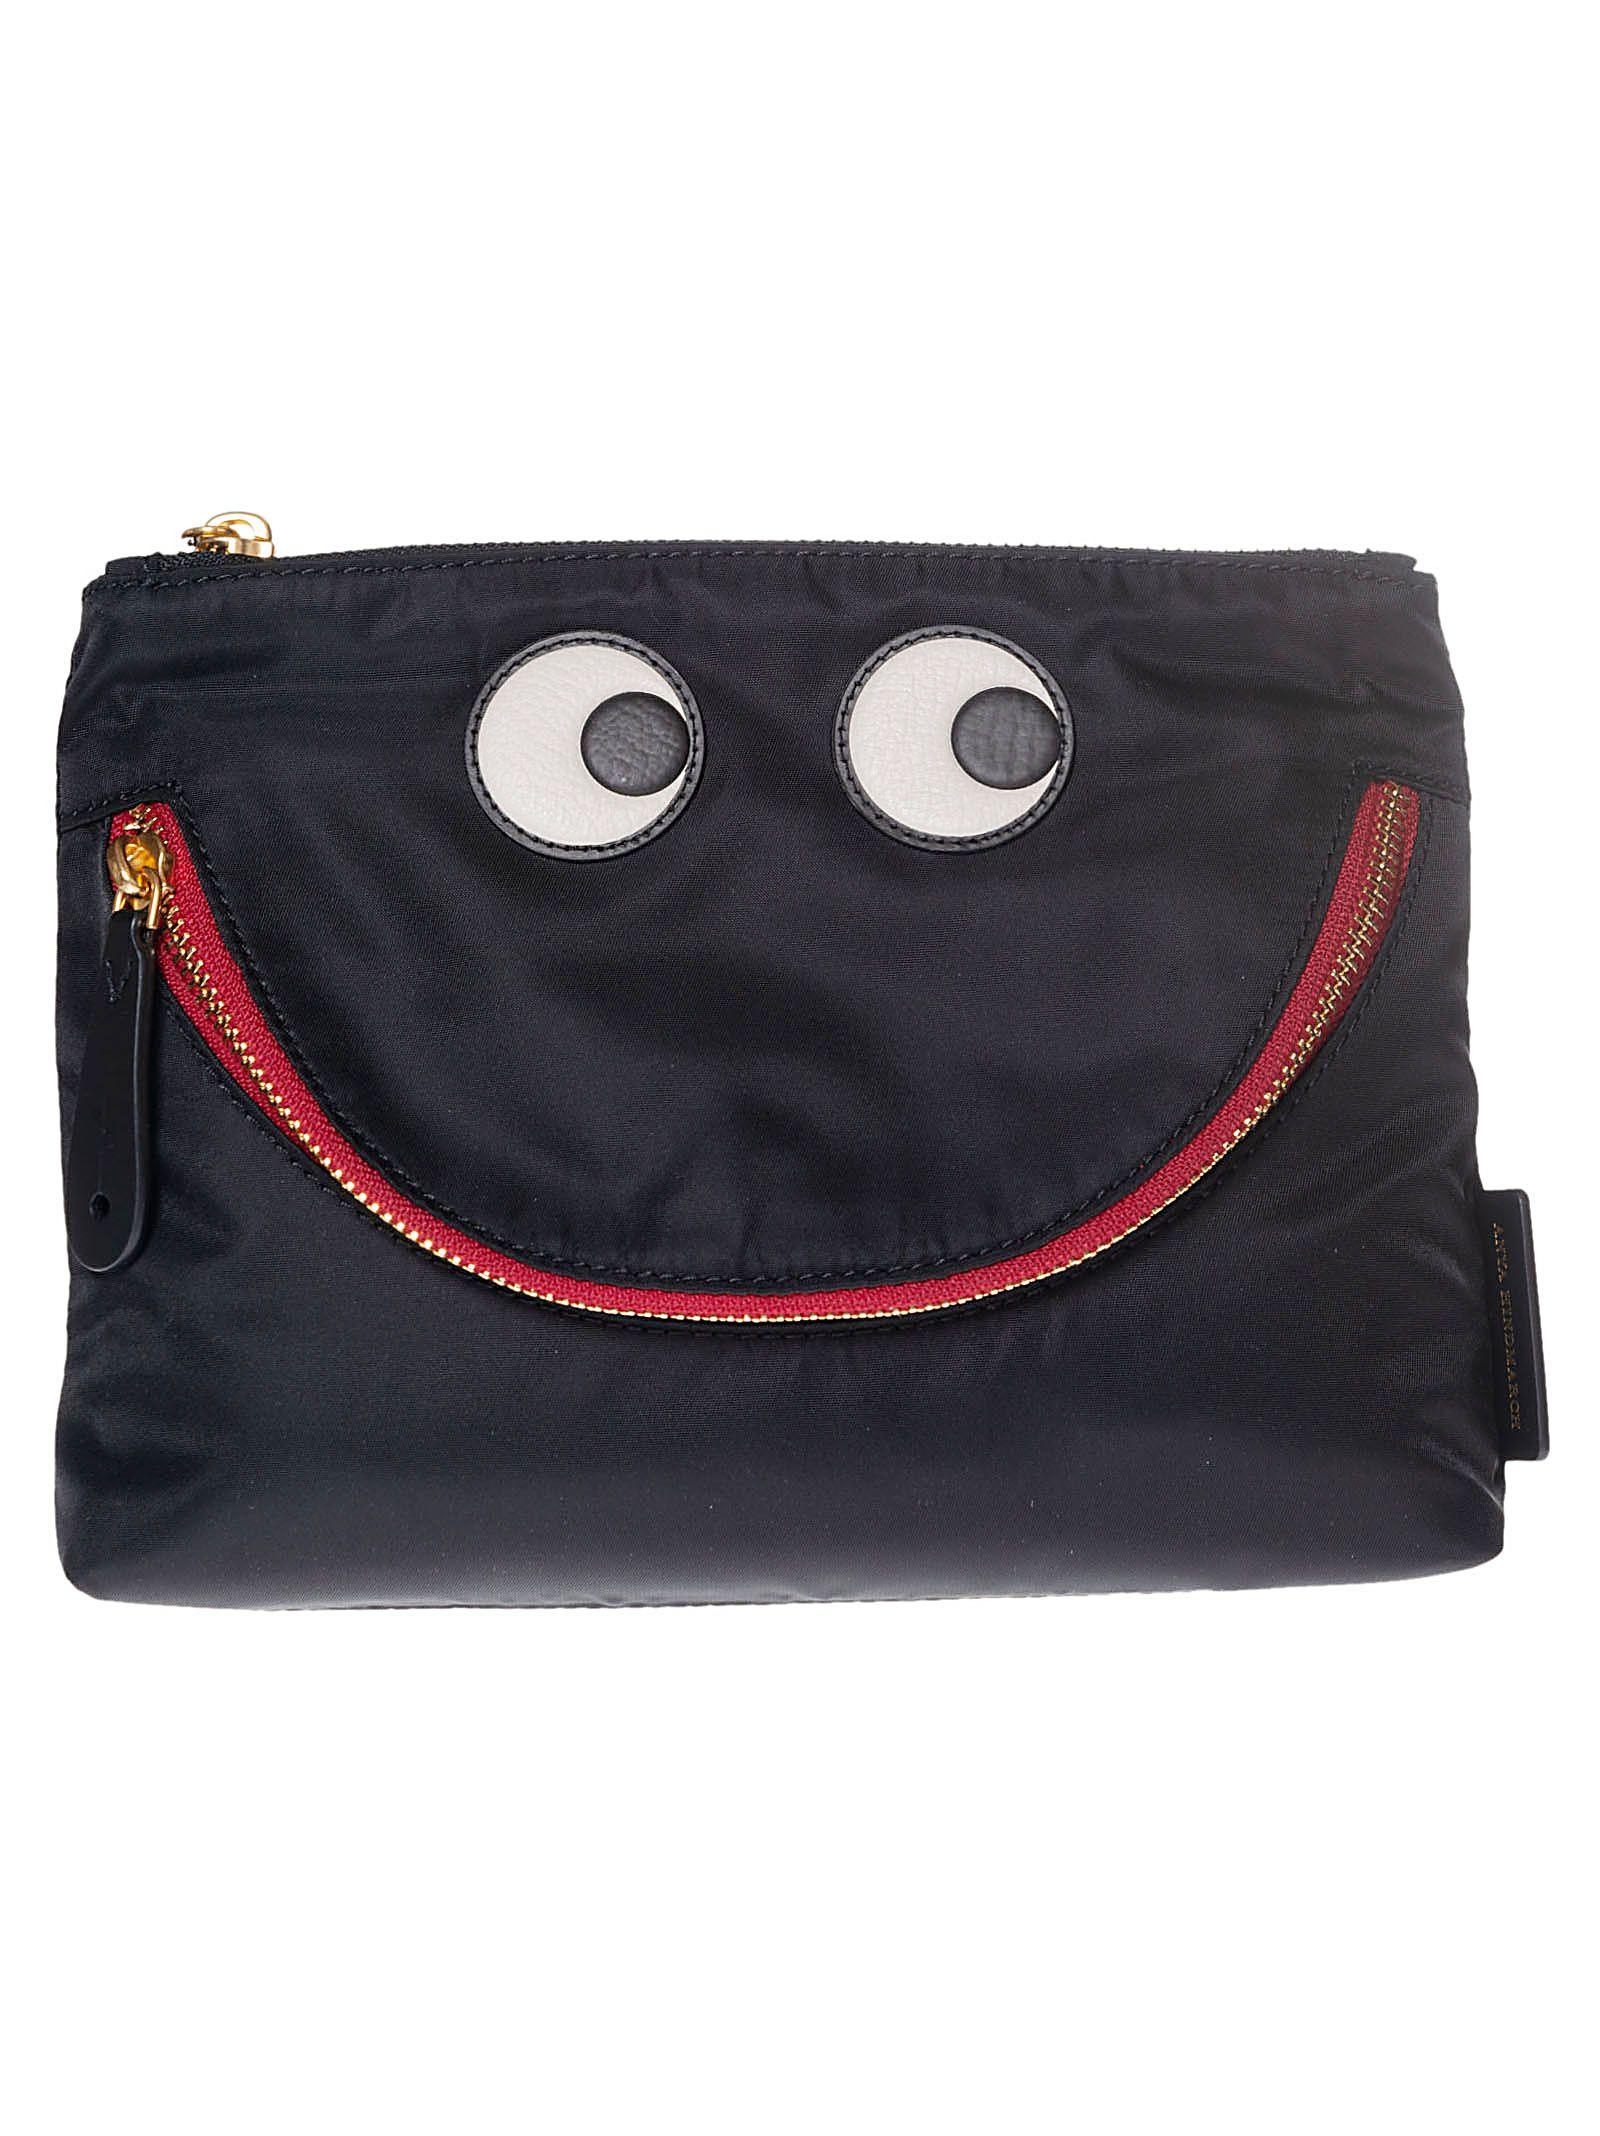 67caacaf3480 Anya Hindmarch Happy Eyes Clutch In Black | ModeSens